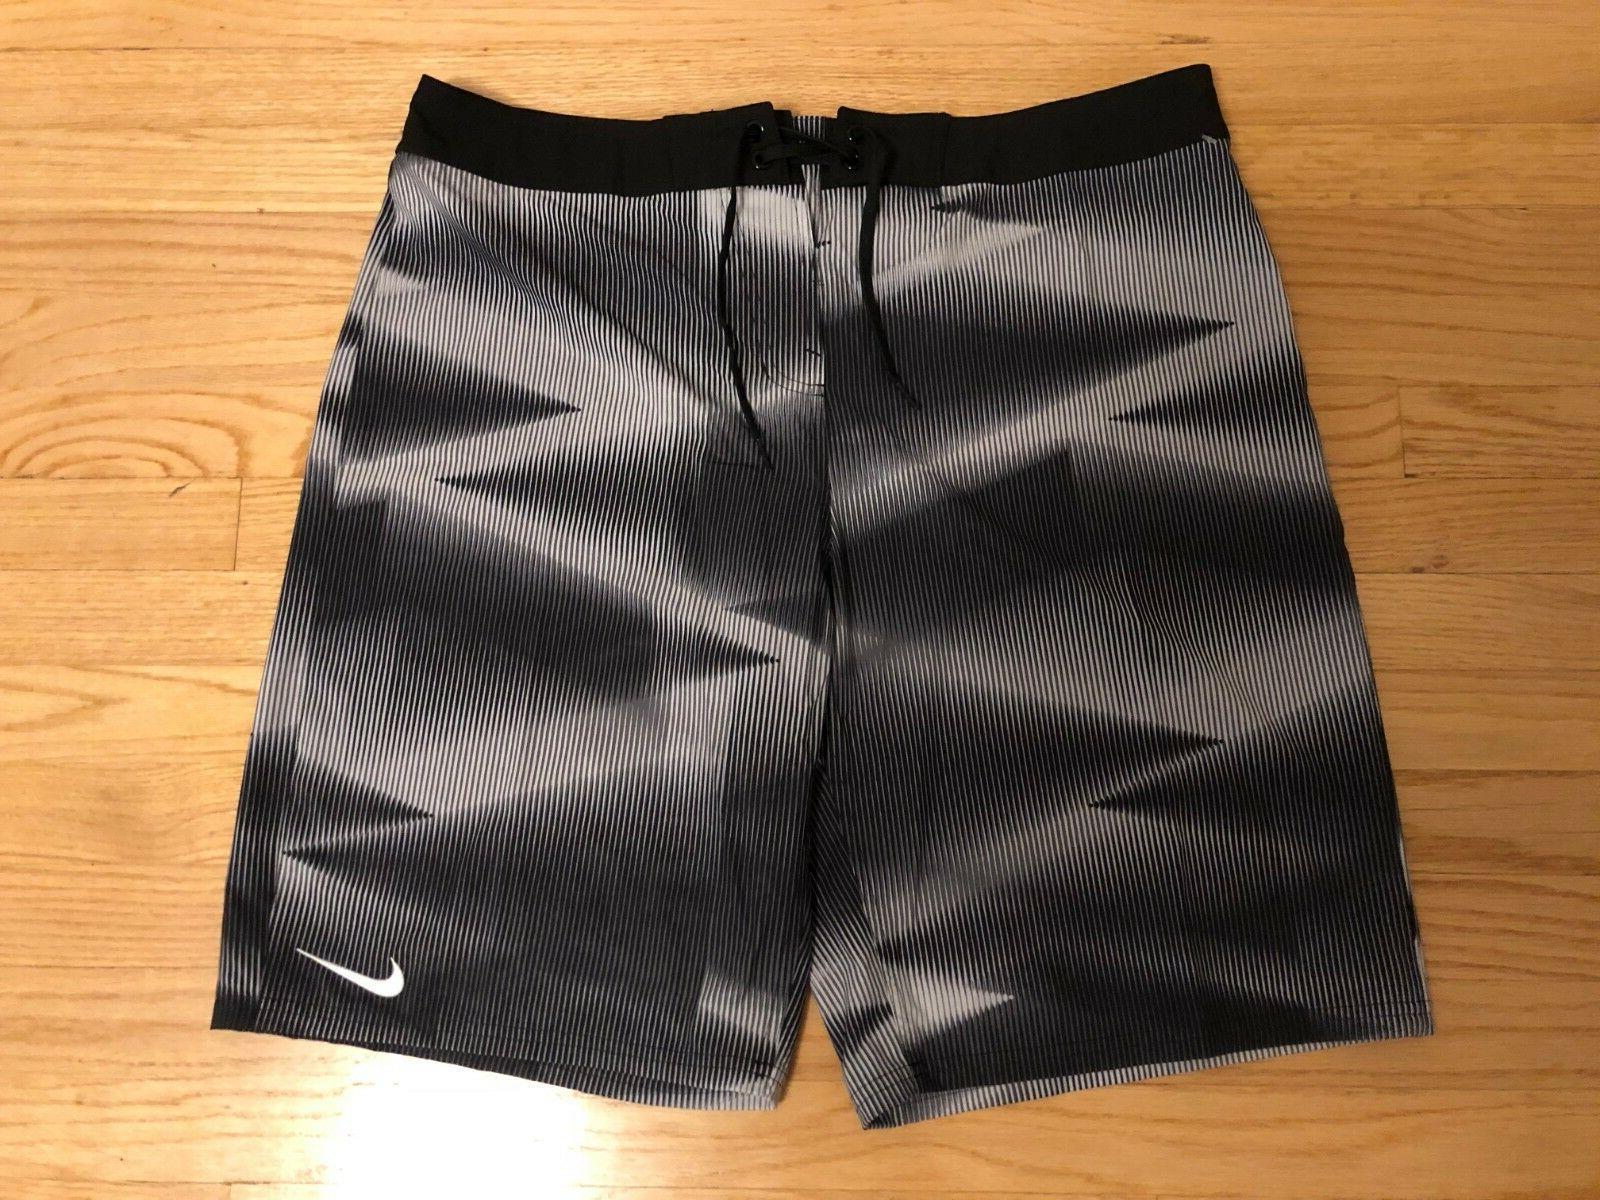 NEW NIKE Vapor Mens Swim Boardshorts Trunks Swimsuit Black/W